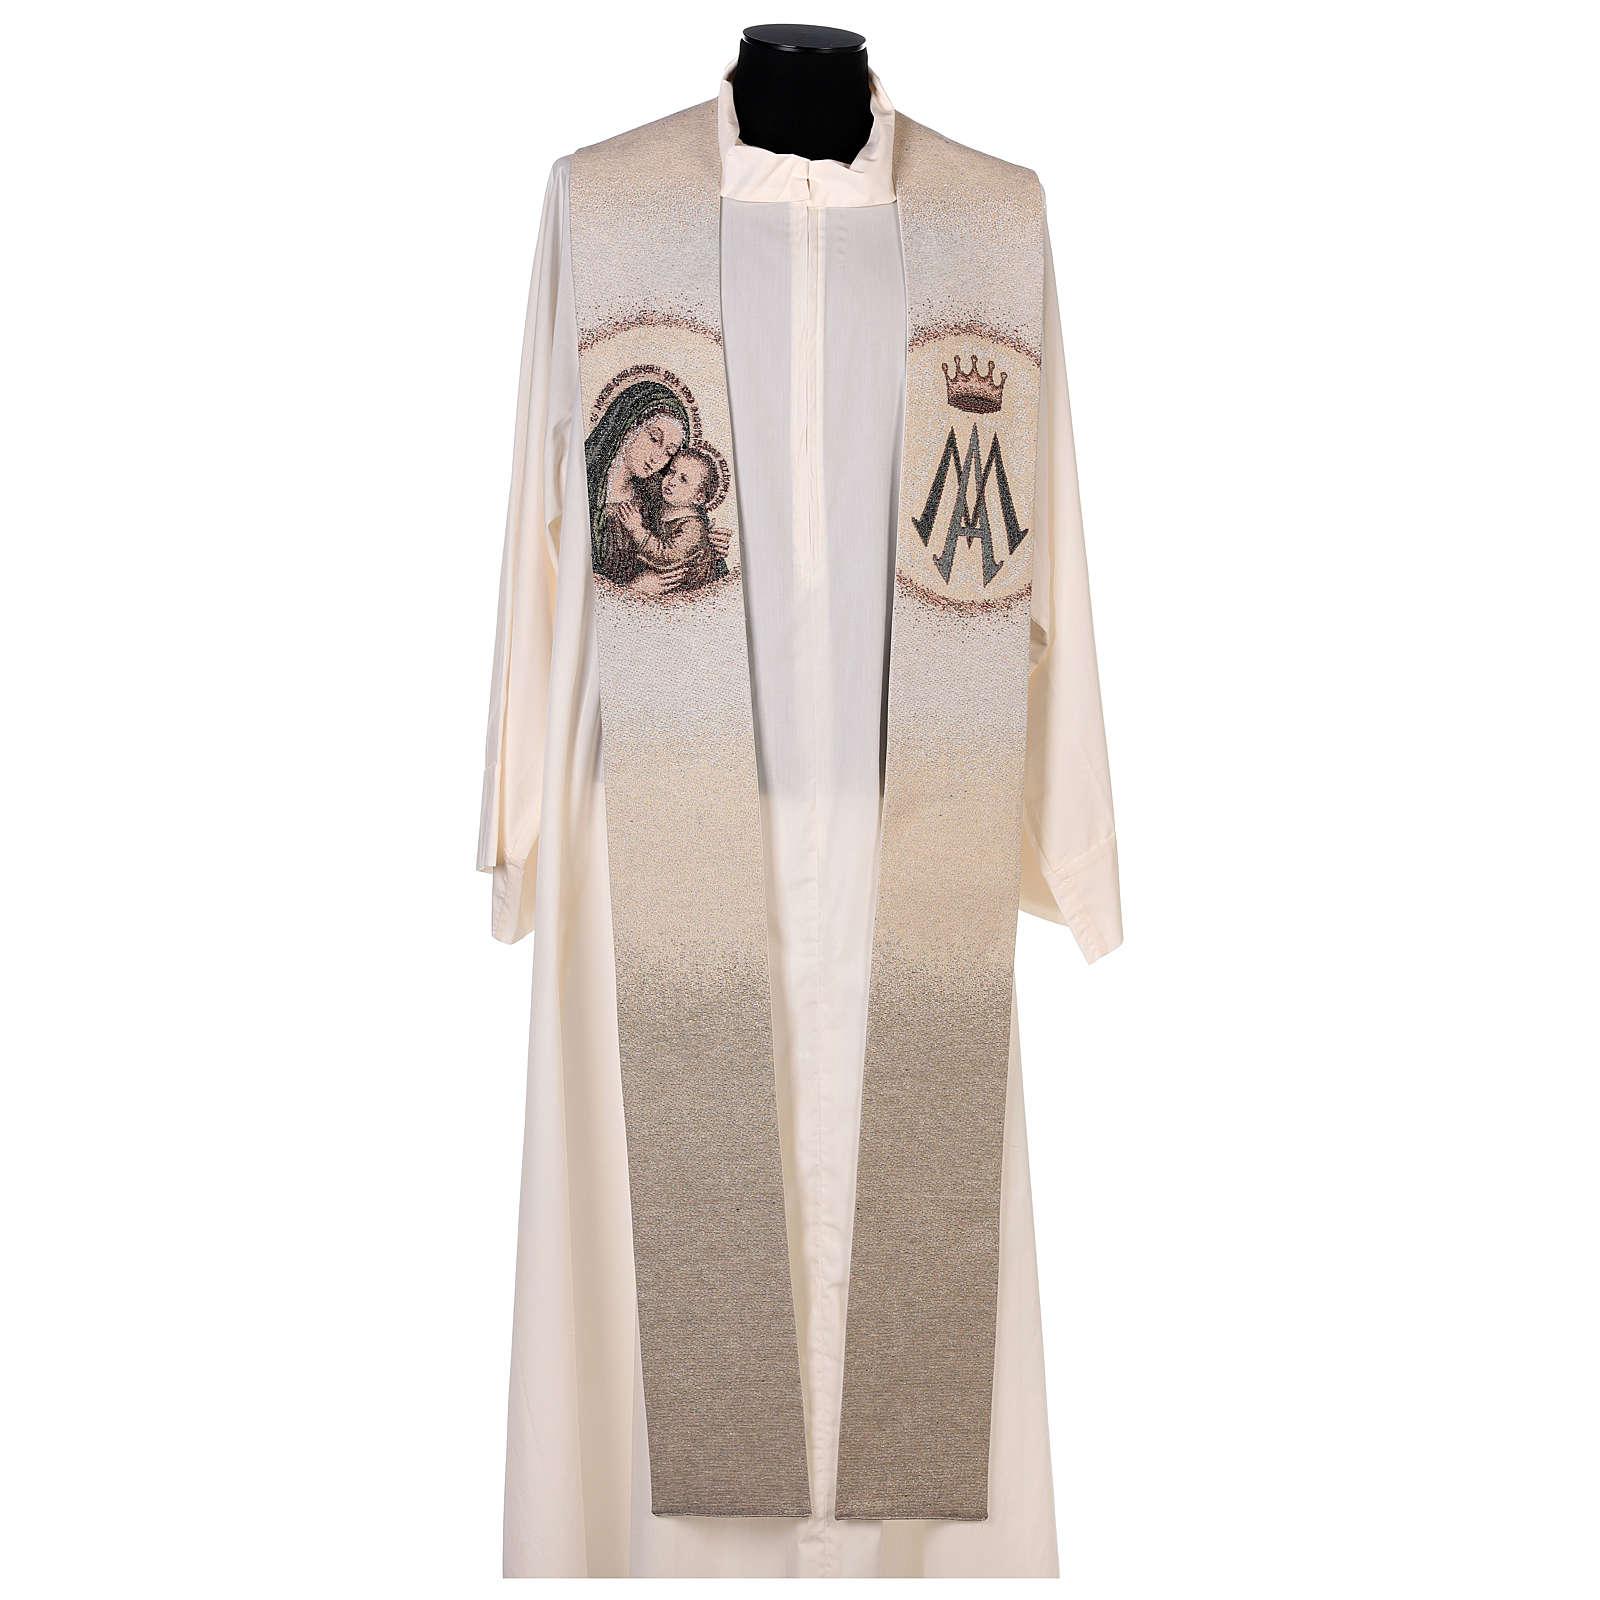 Estatua Virgen del Consejo símbolo mariano marfil 4